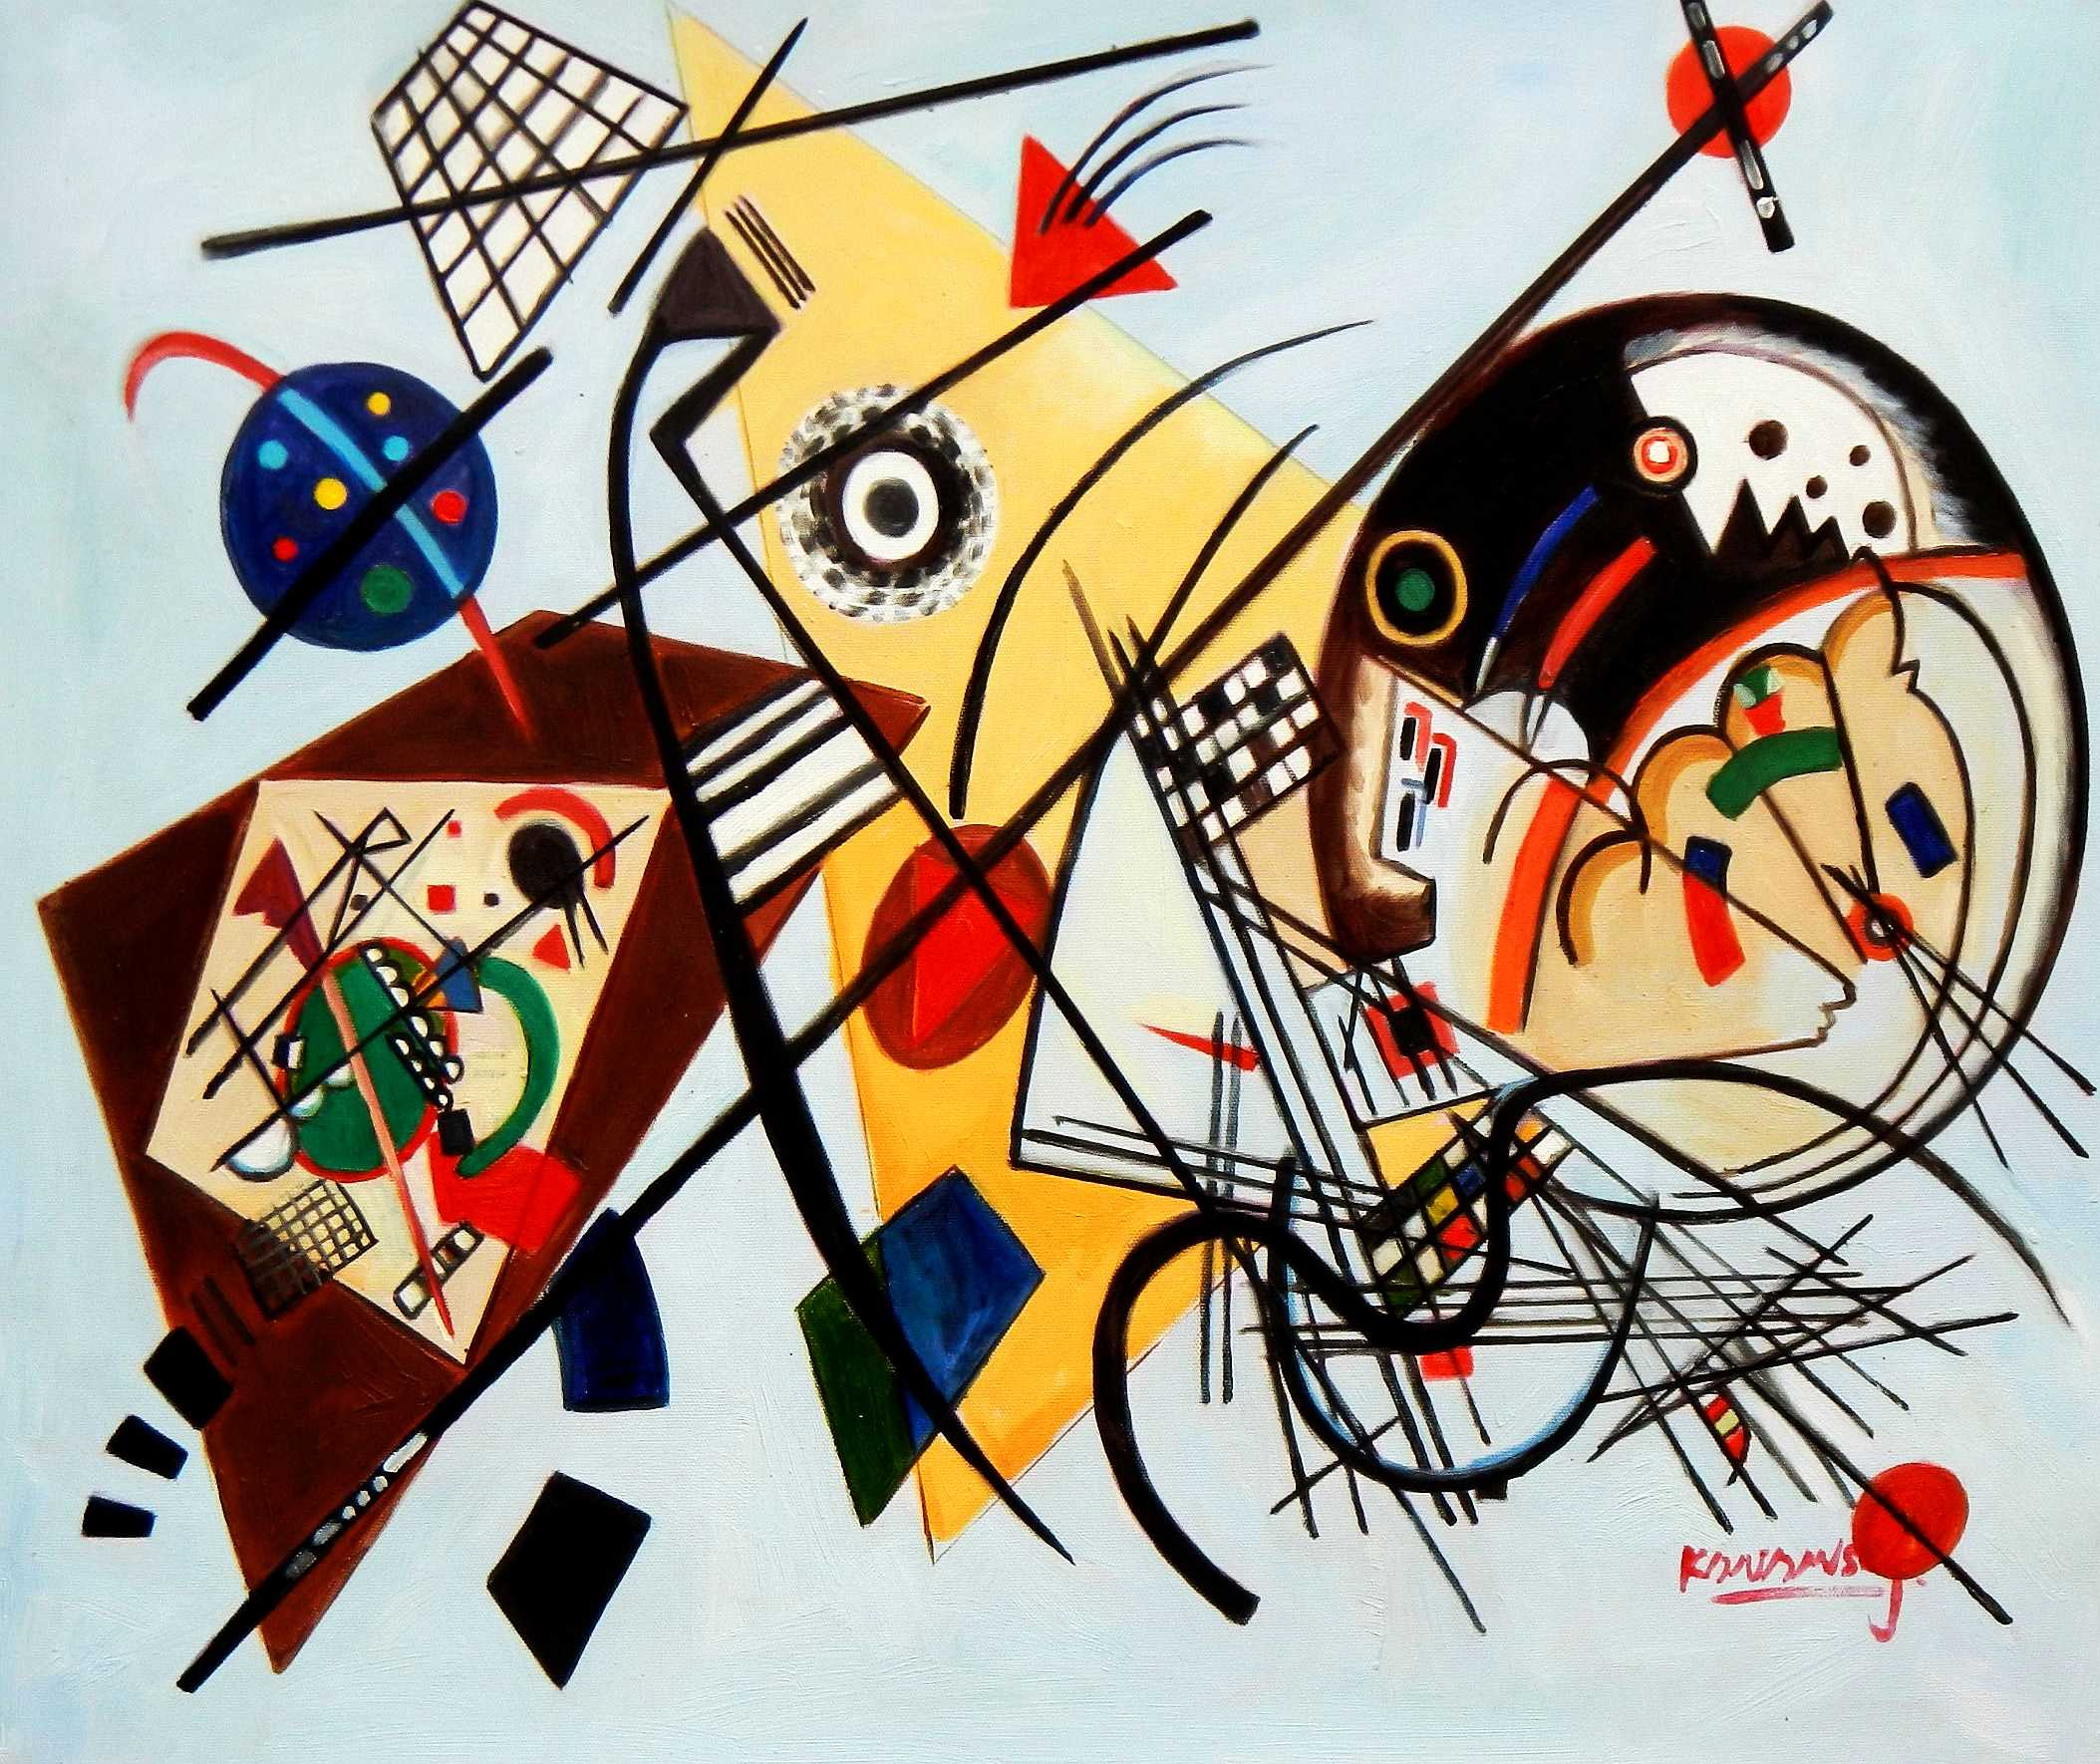 Wassily Kandinsky - Querlinie c95773 50x60cm exzellentes Ölgemälde